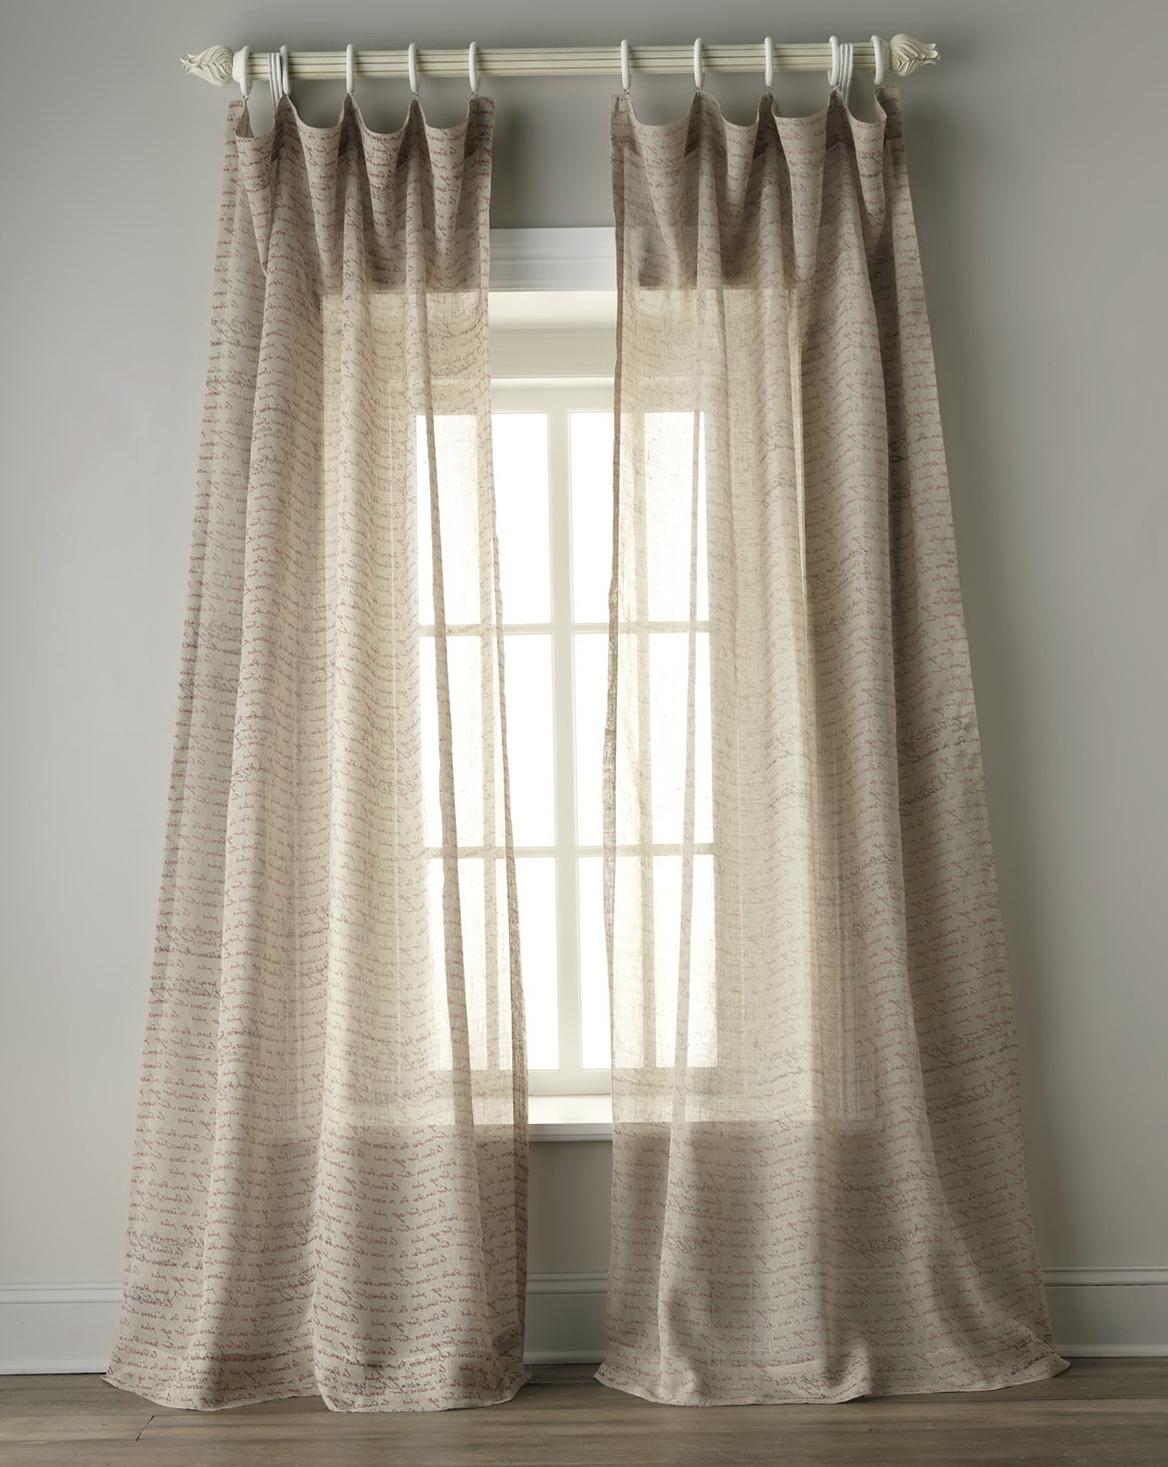 Bellagio linen curtains